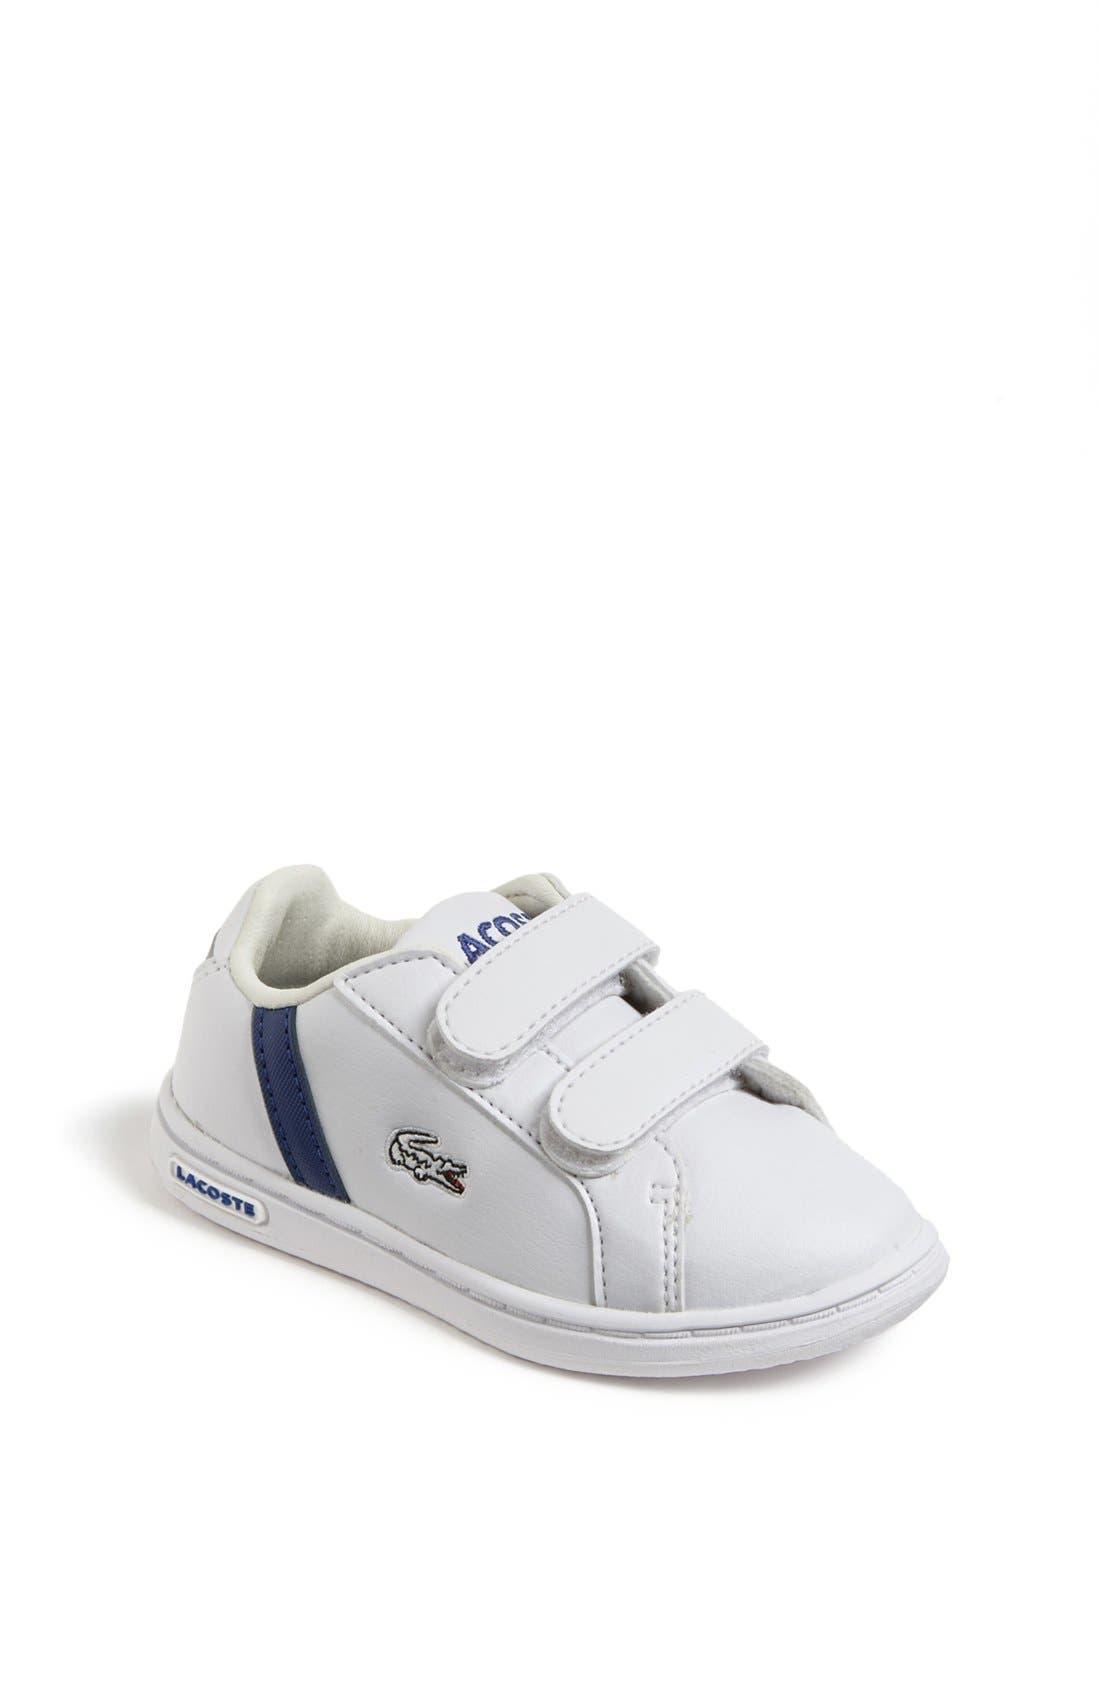 Alternate Image 1 Selected - Lacoste 'Renard' Sneaker (Baby, Walker & Toddler)